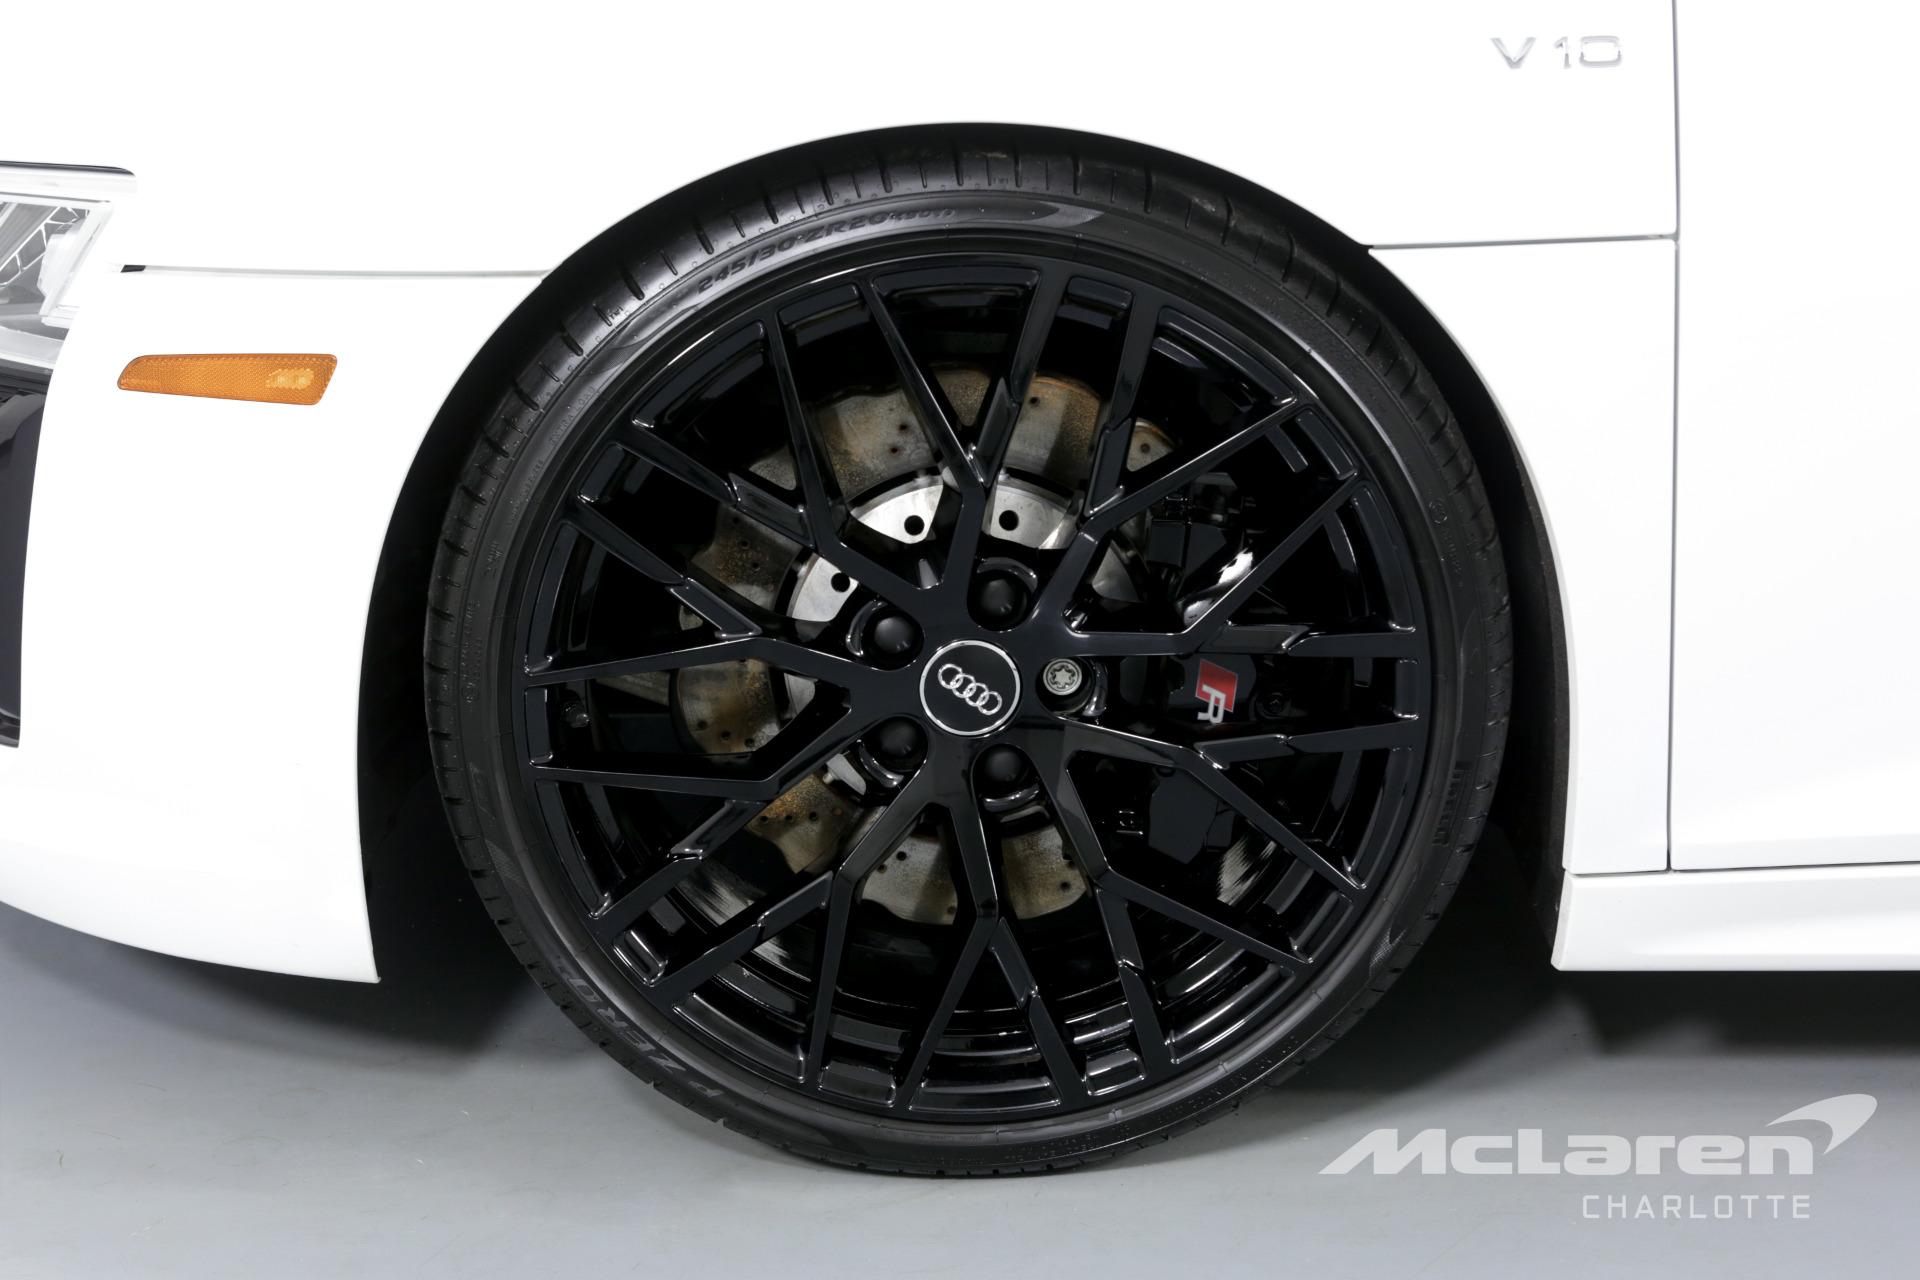 Used 2018 Audi R8 5.2 quattro V10 Spyder | Charlotte, NC